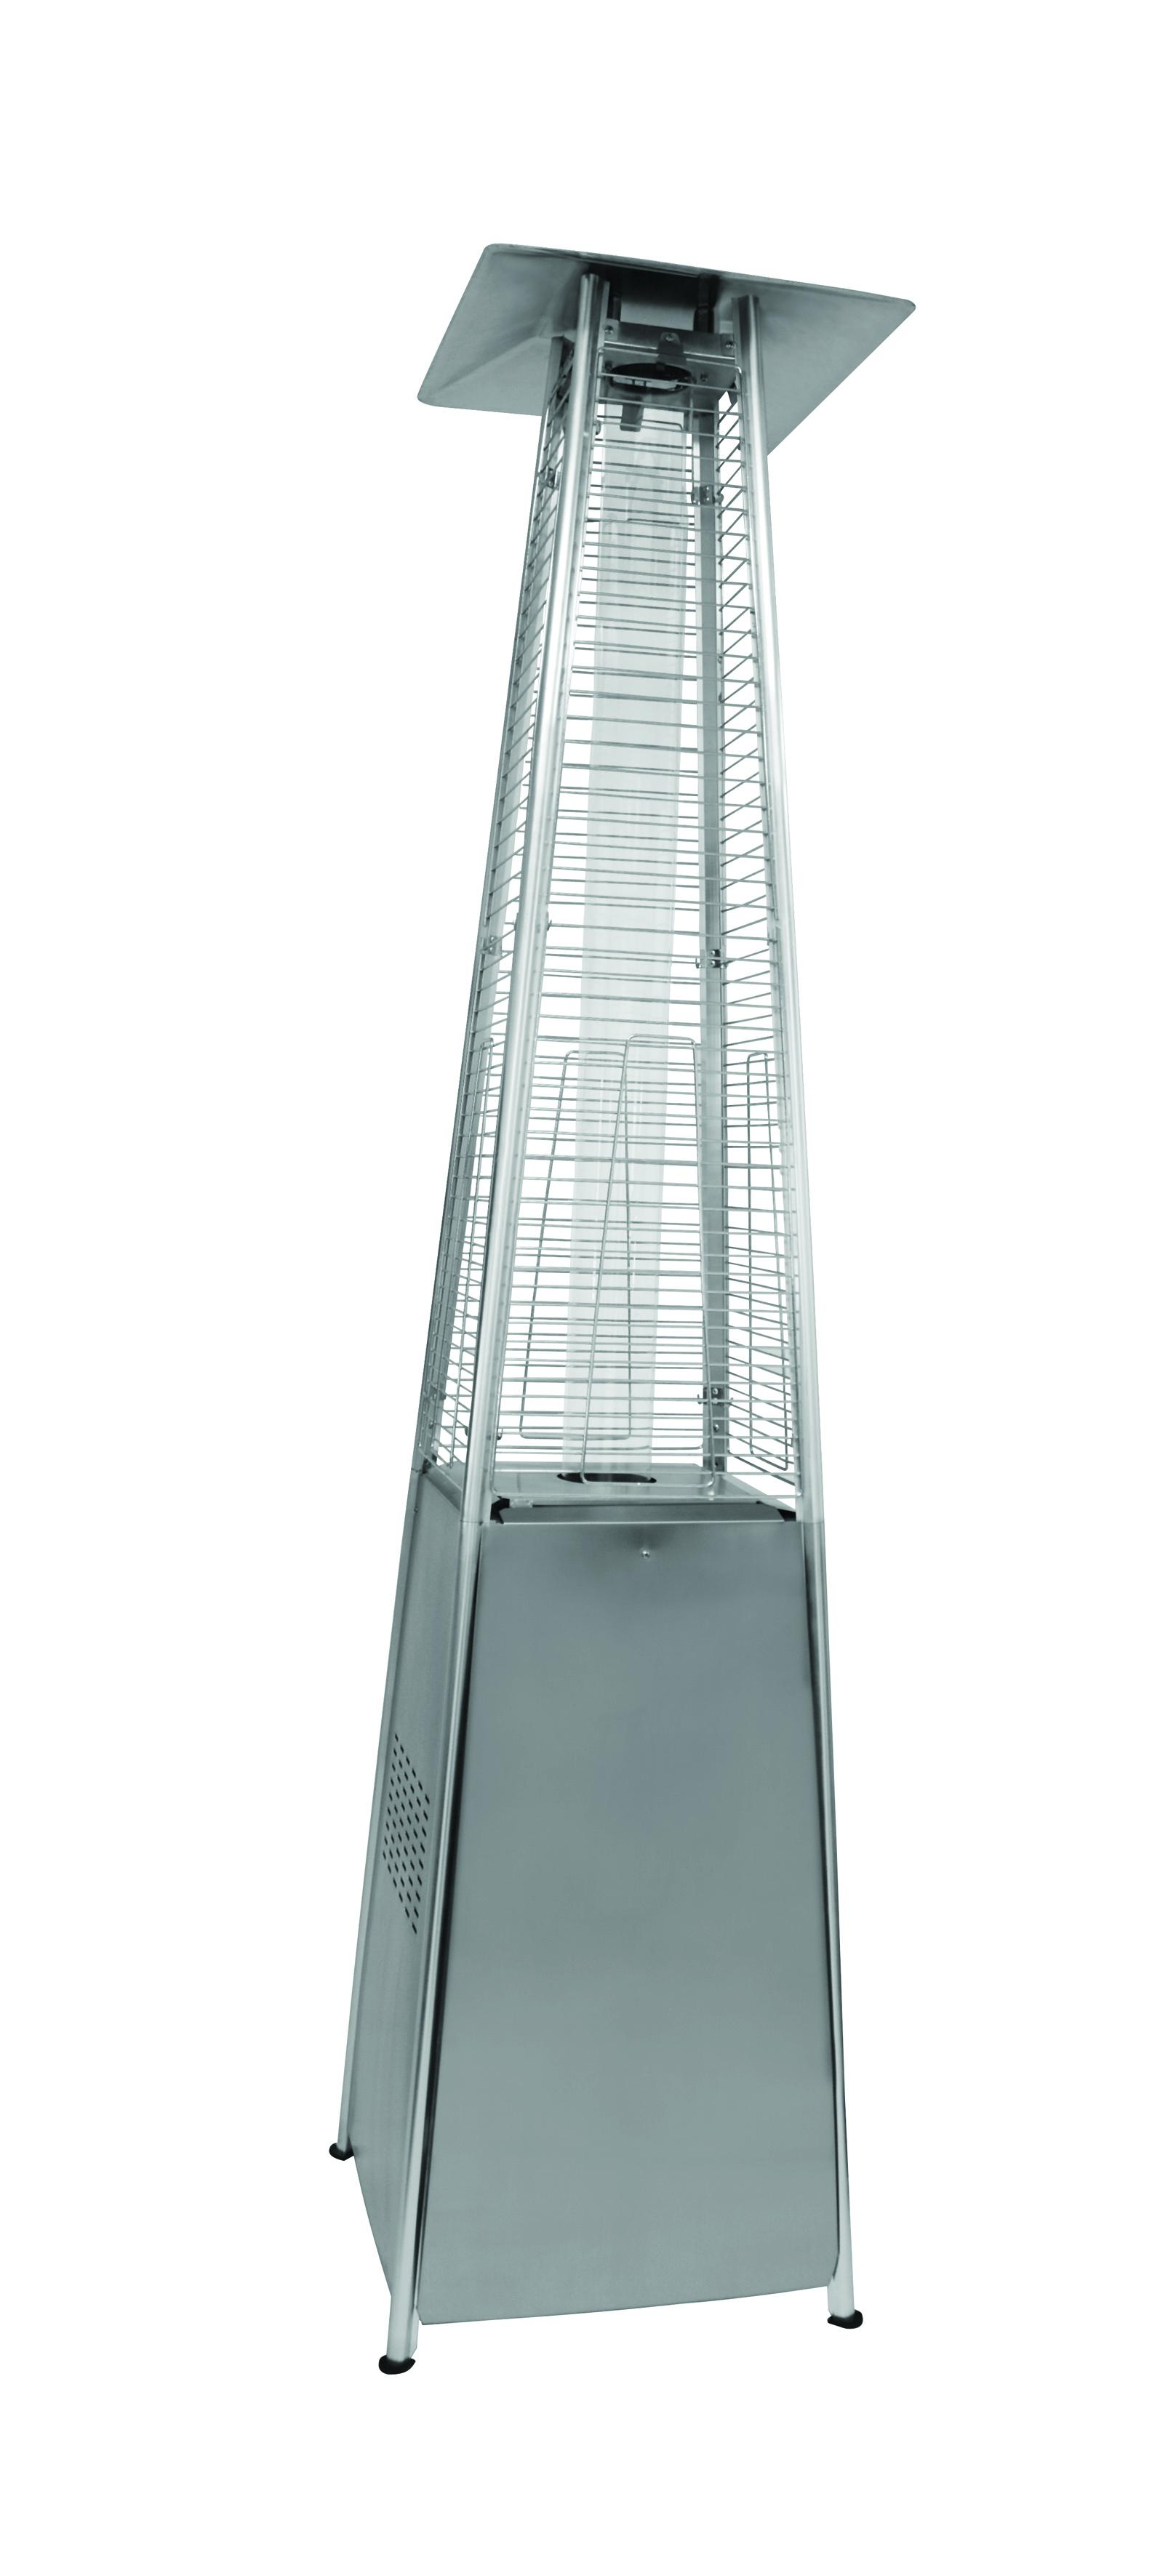 gallery designer tube alva heaters images patio heater glass